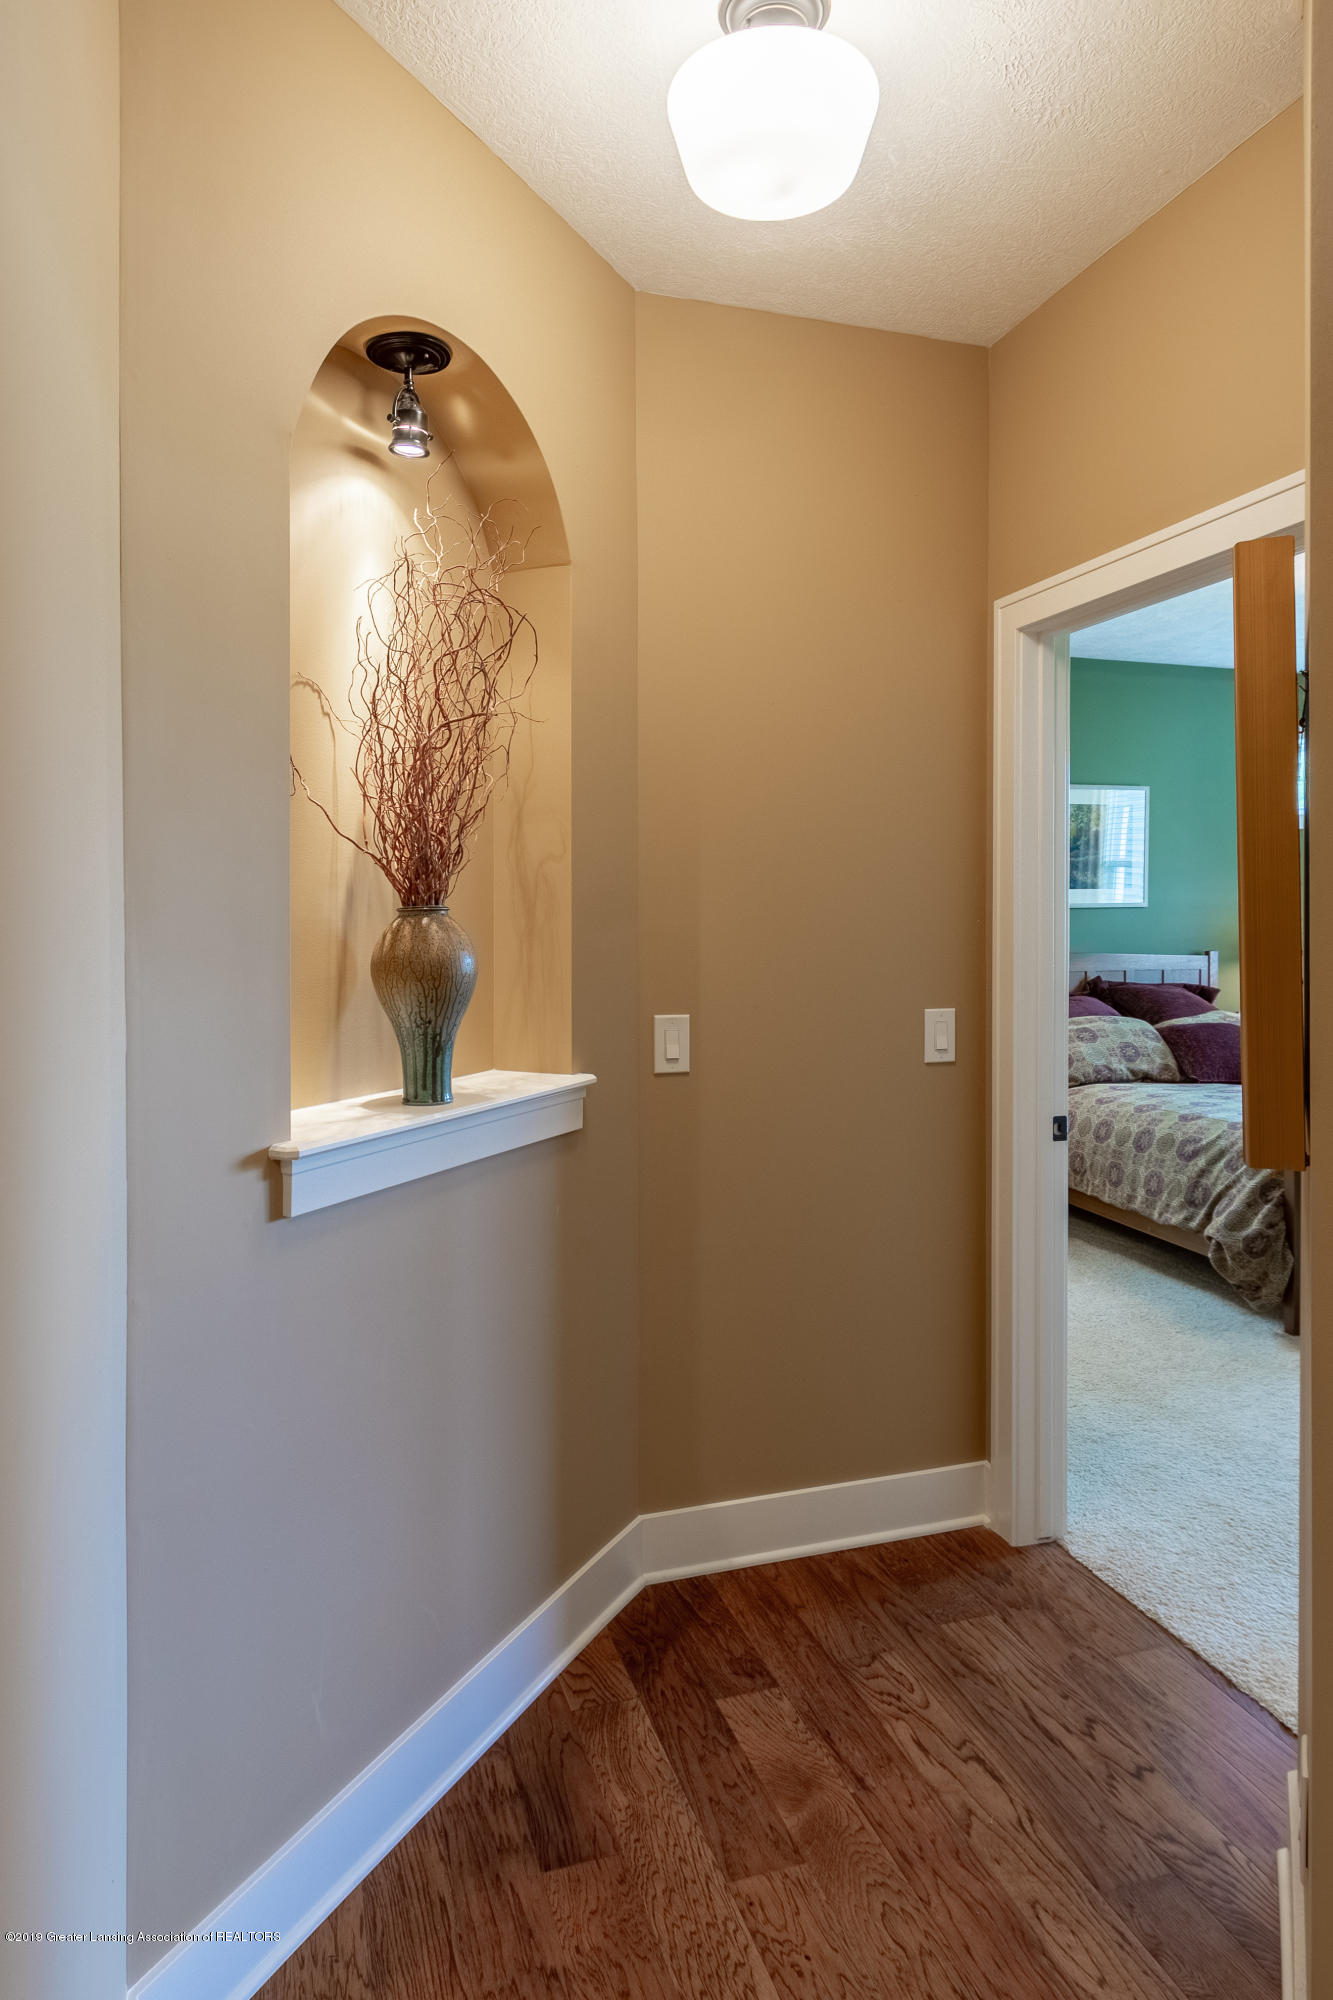 4134 E Benca Way - Hallway to Master Suite - 37